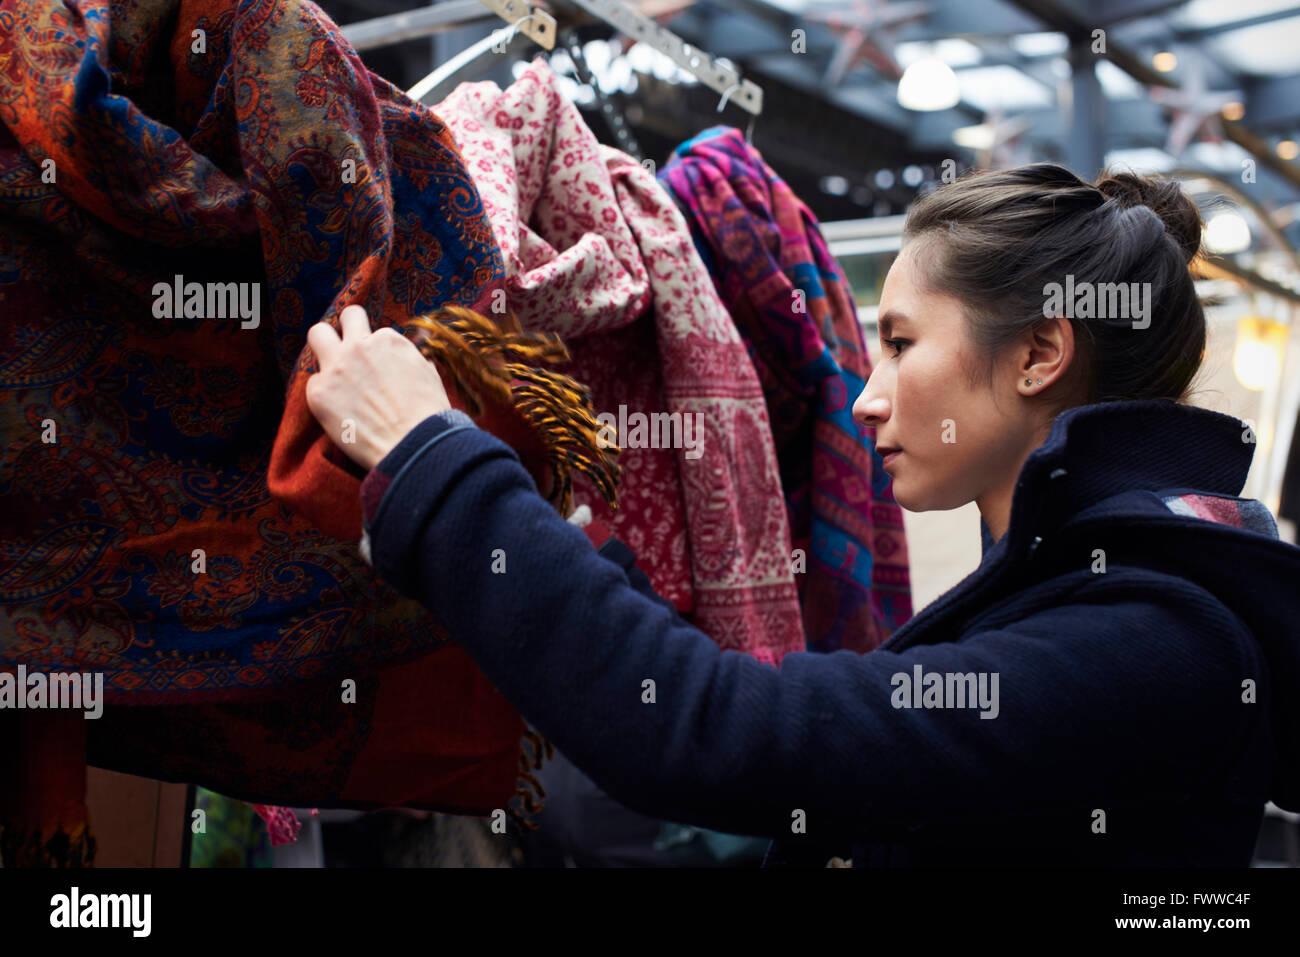 Giovane Donna Shopping nel mercato coperto Immagini Stock